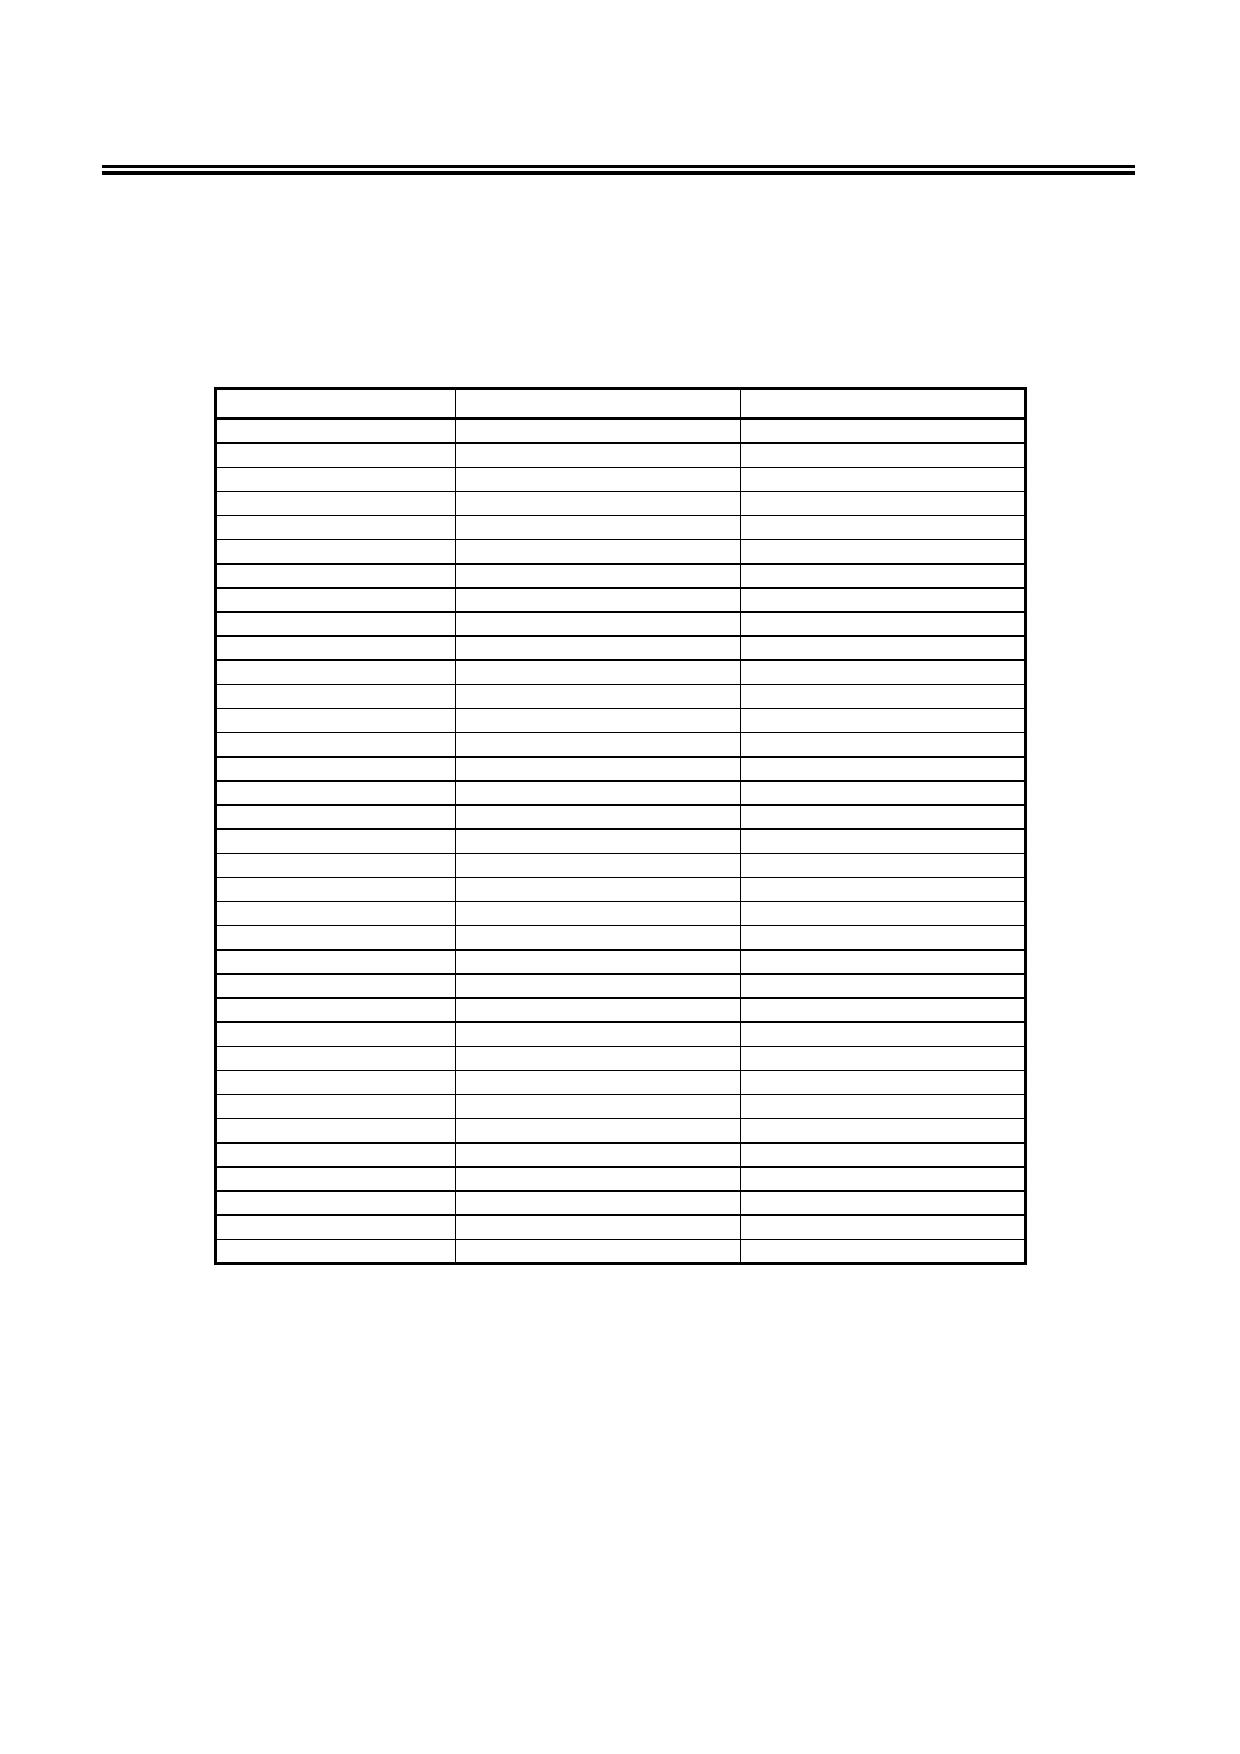 S-1315 pdf, arduino